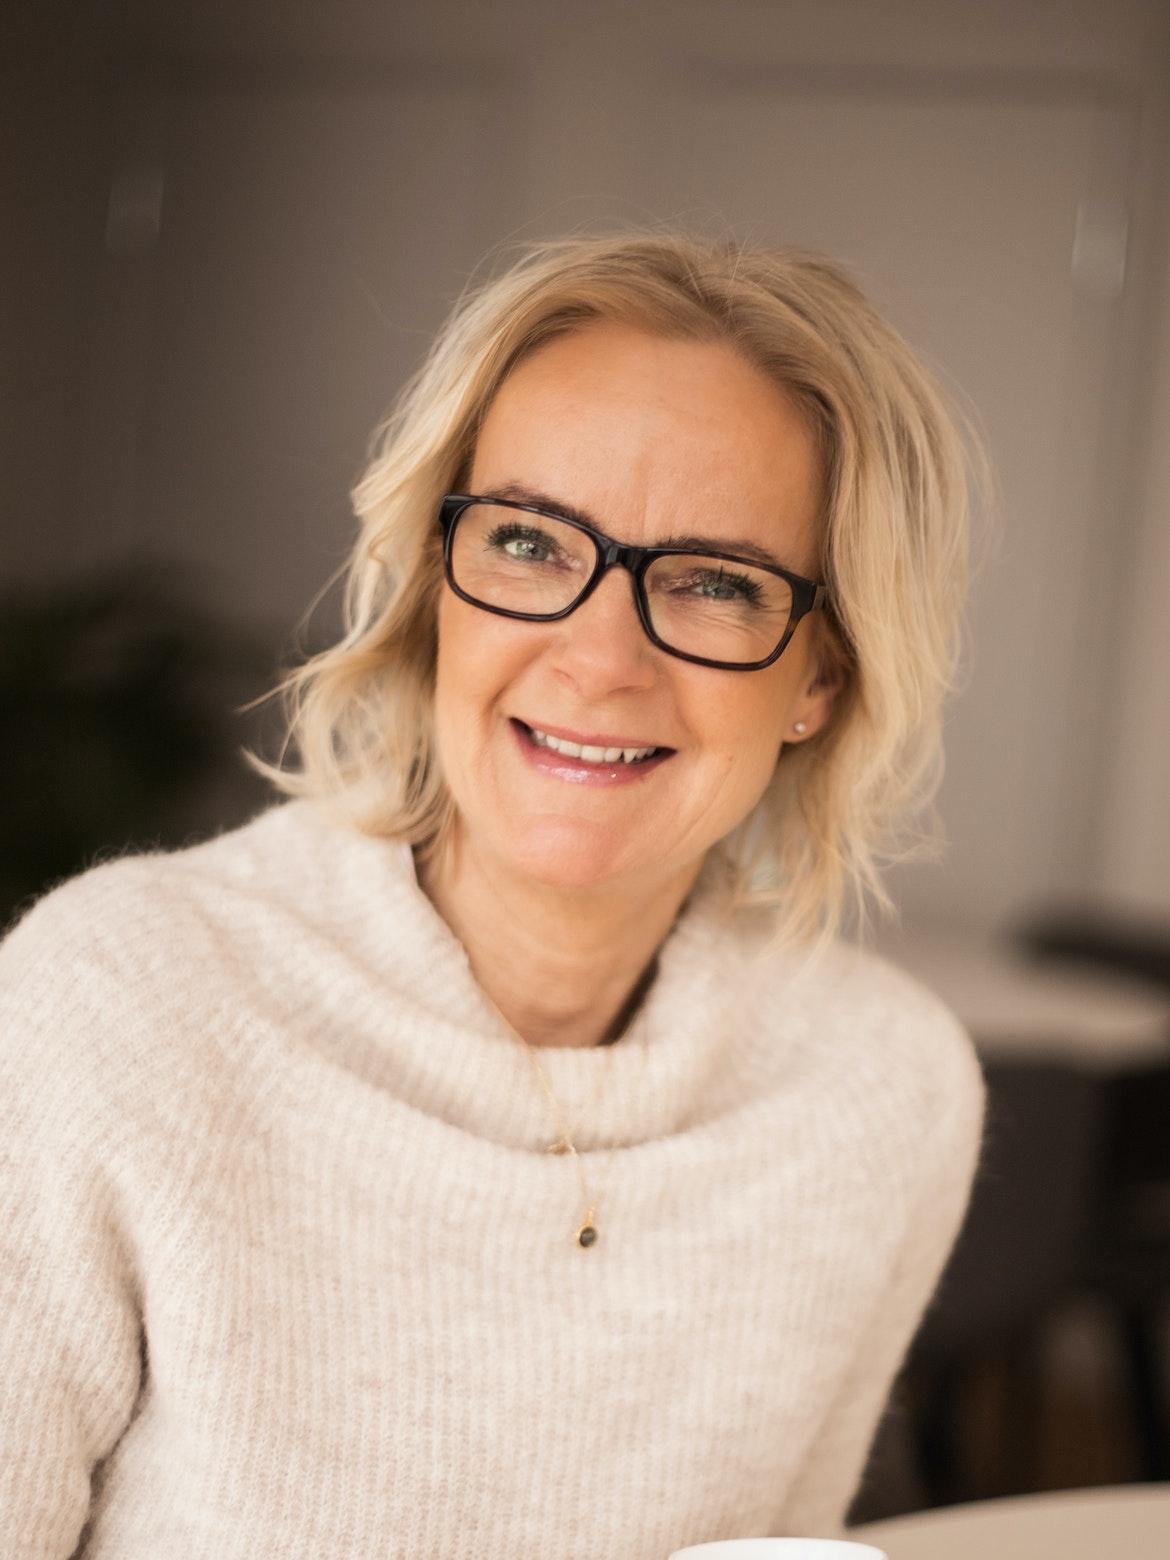 Marit Bjørnerud 1 1